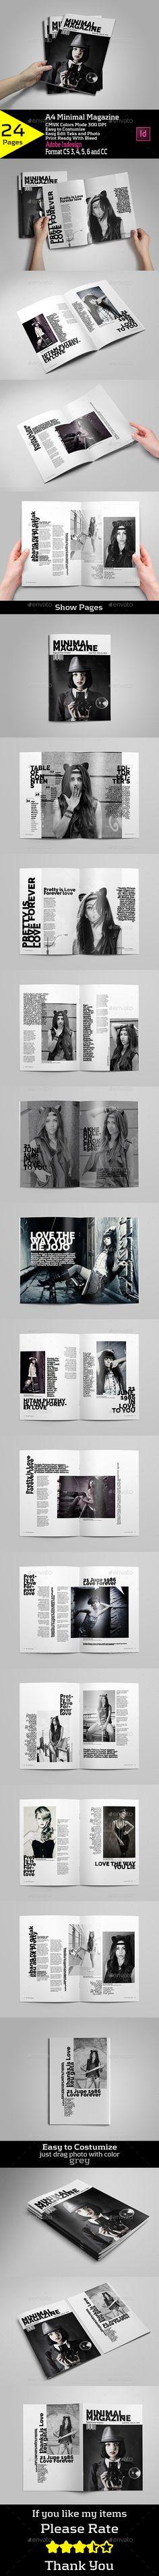 A4 Minimal Magazine - Magazines Print Templates